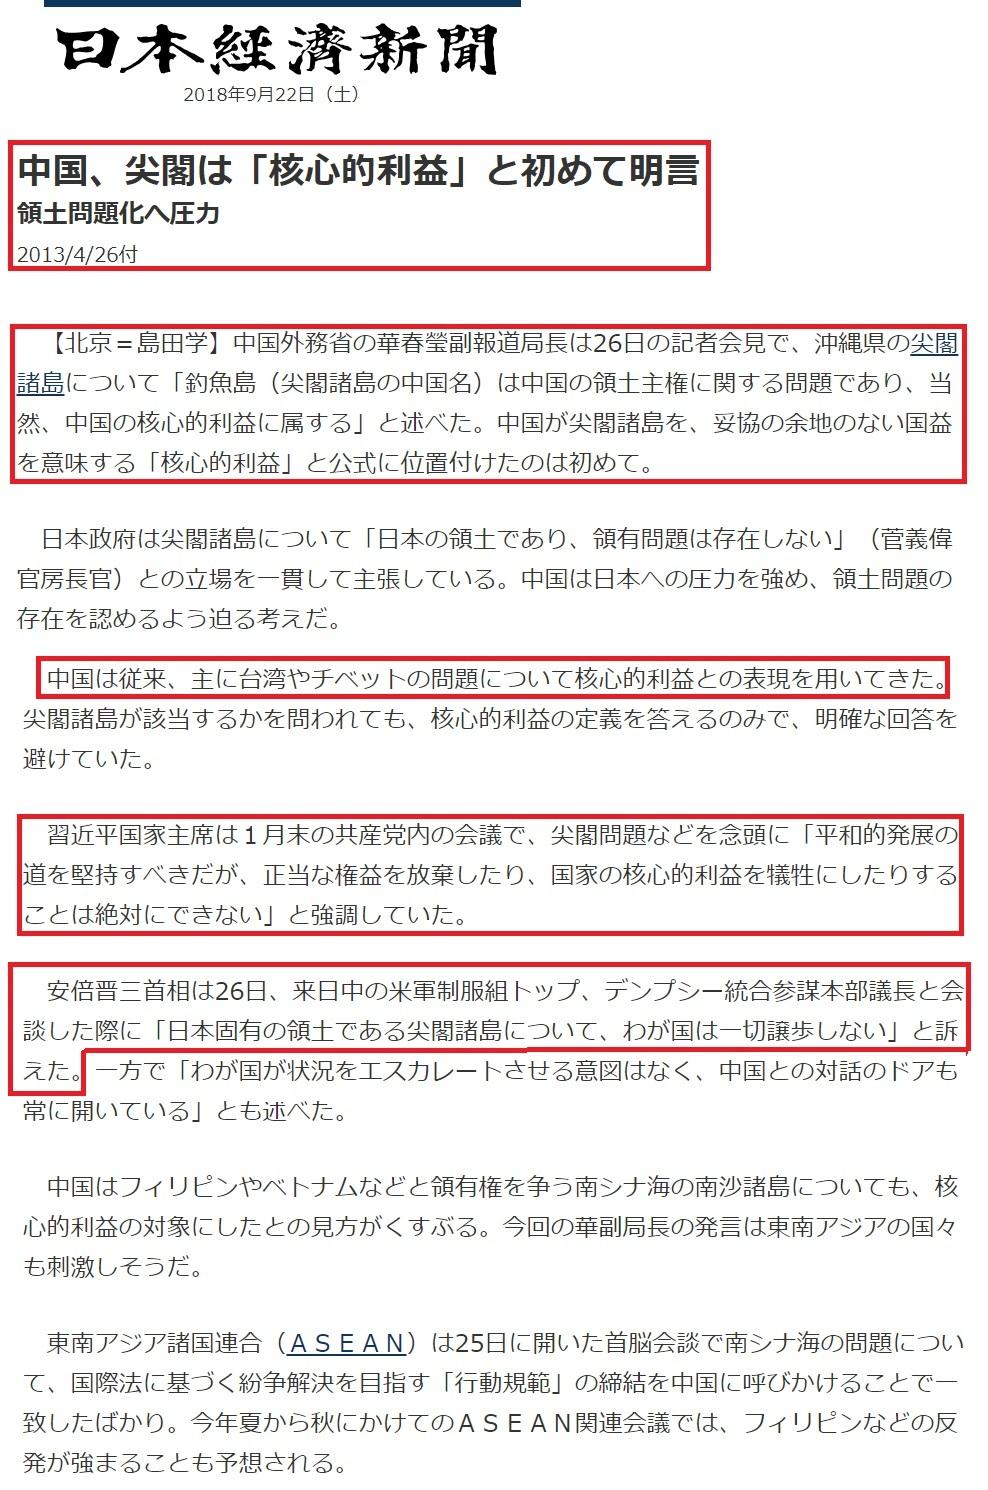 シナ共産党「尖閣は核心的利益」